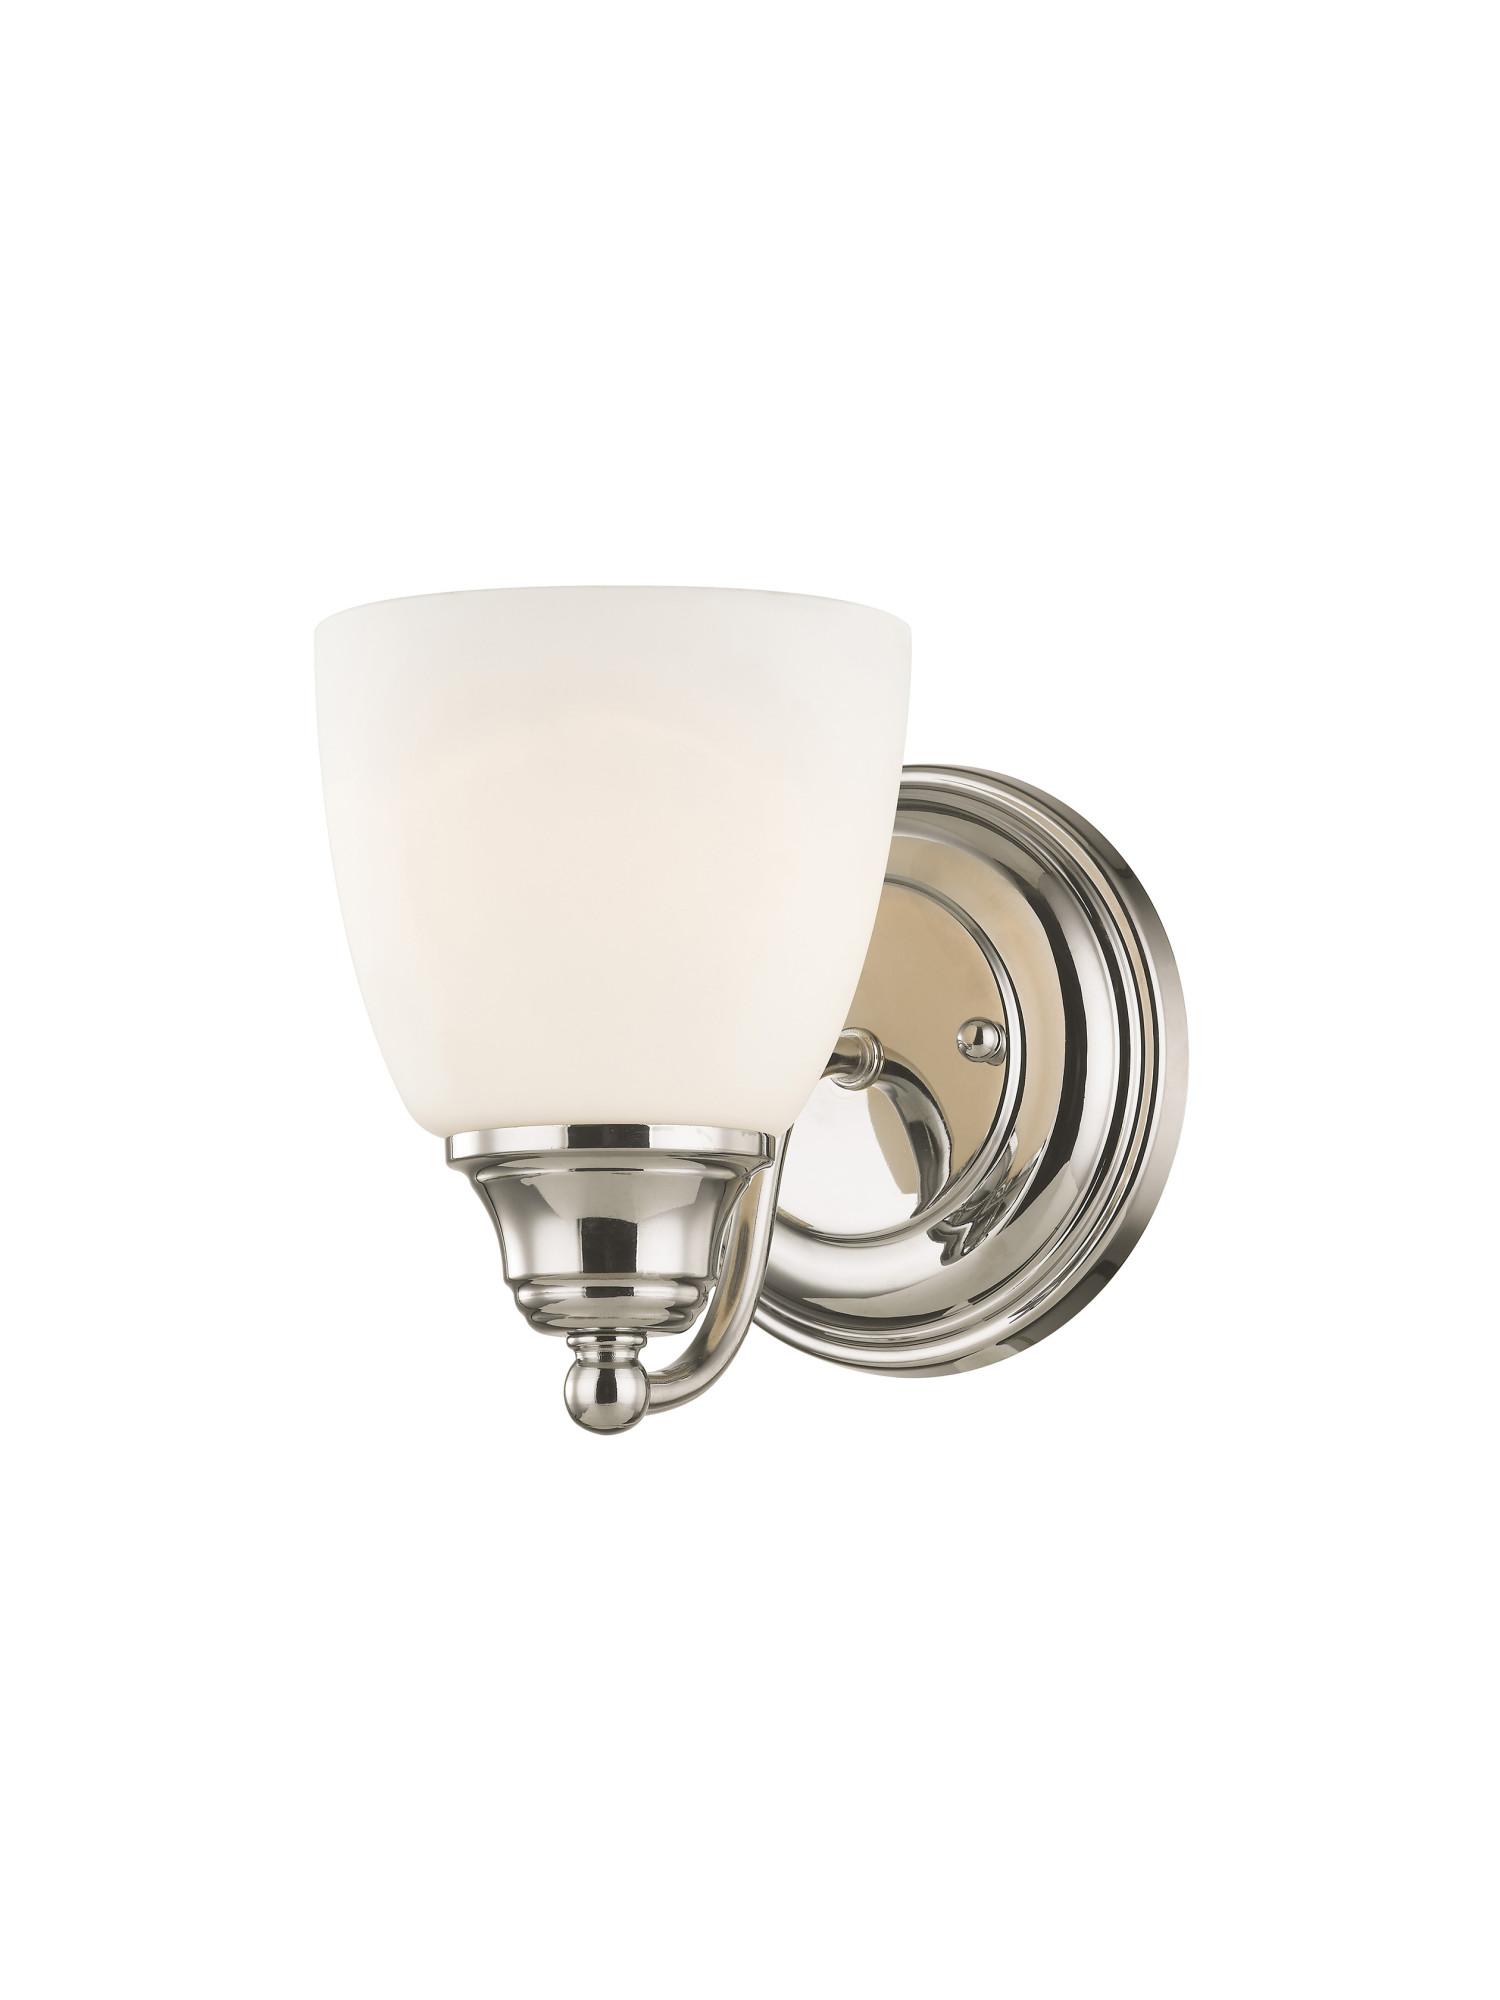 Polished Brass 13671-02 Livex Lighting Somerville Wall Sconces